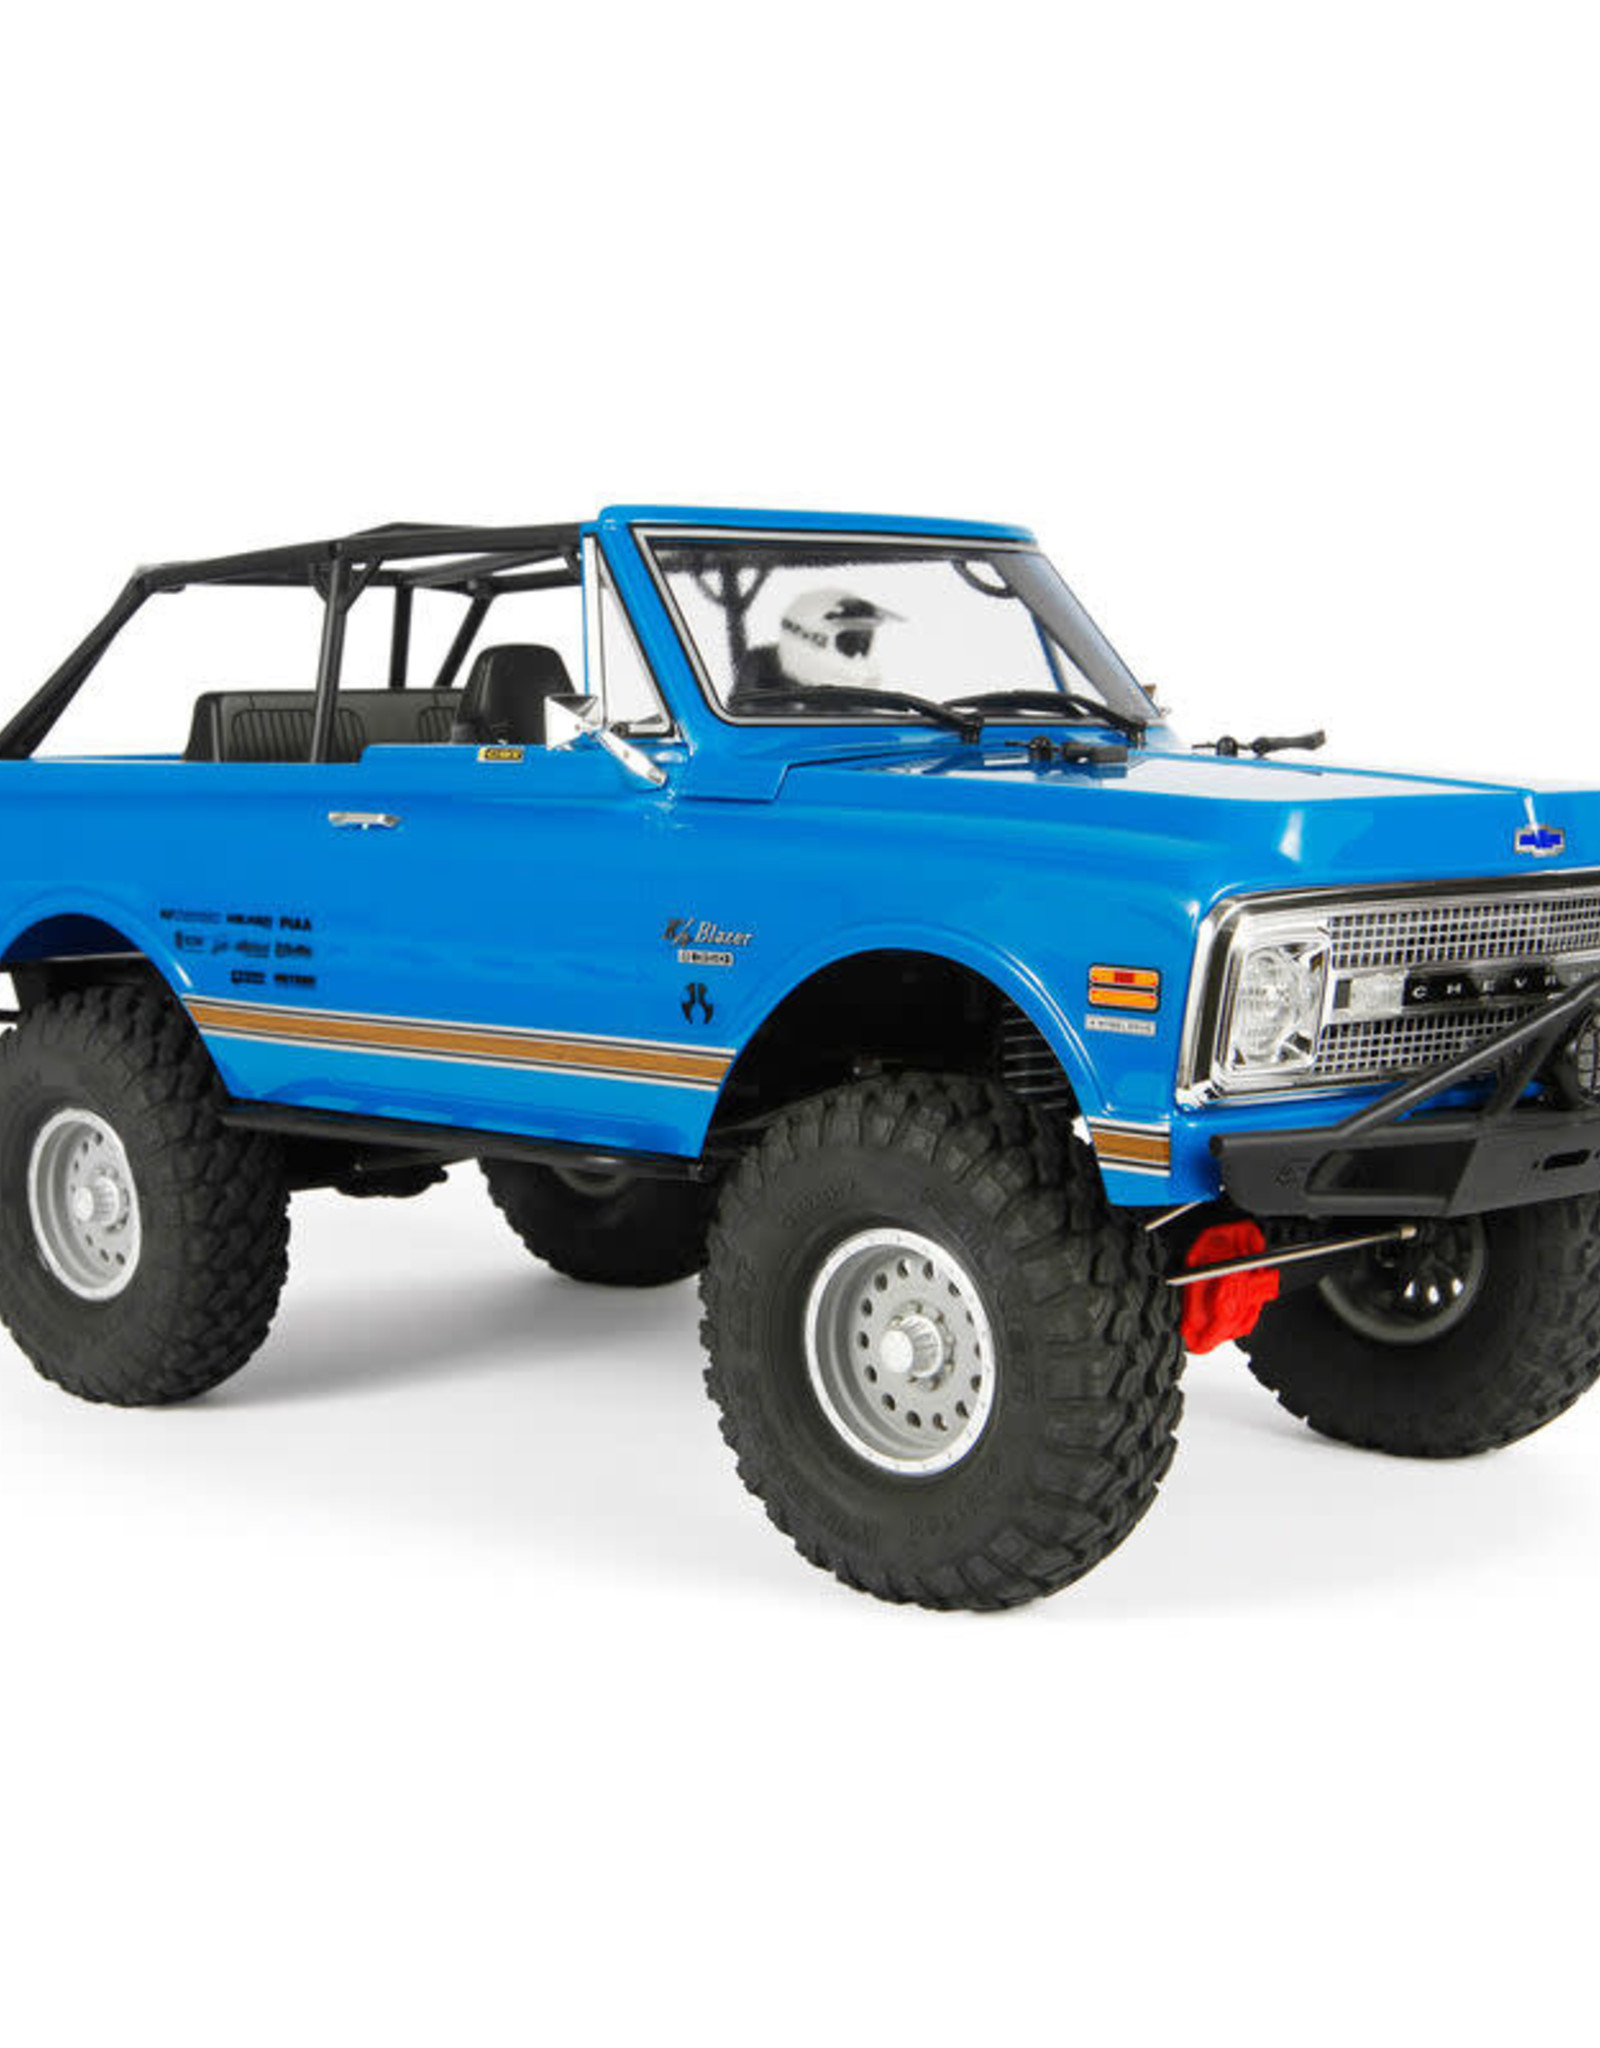 Axial AX90058 SCX10 II '69 Chevrolet Blazer 4WD RTR